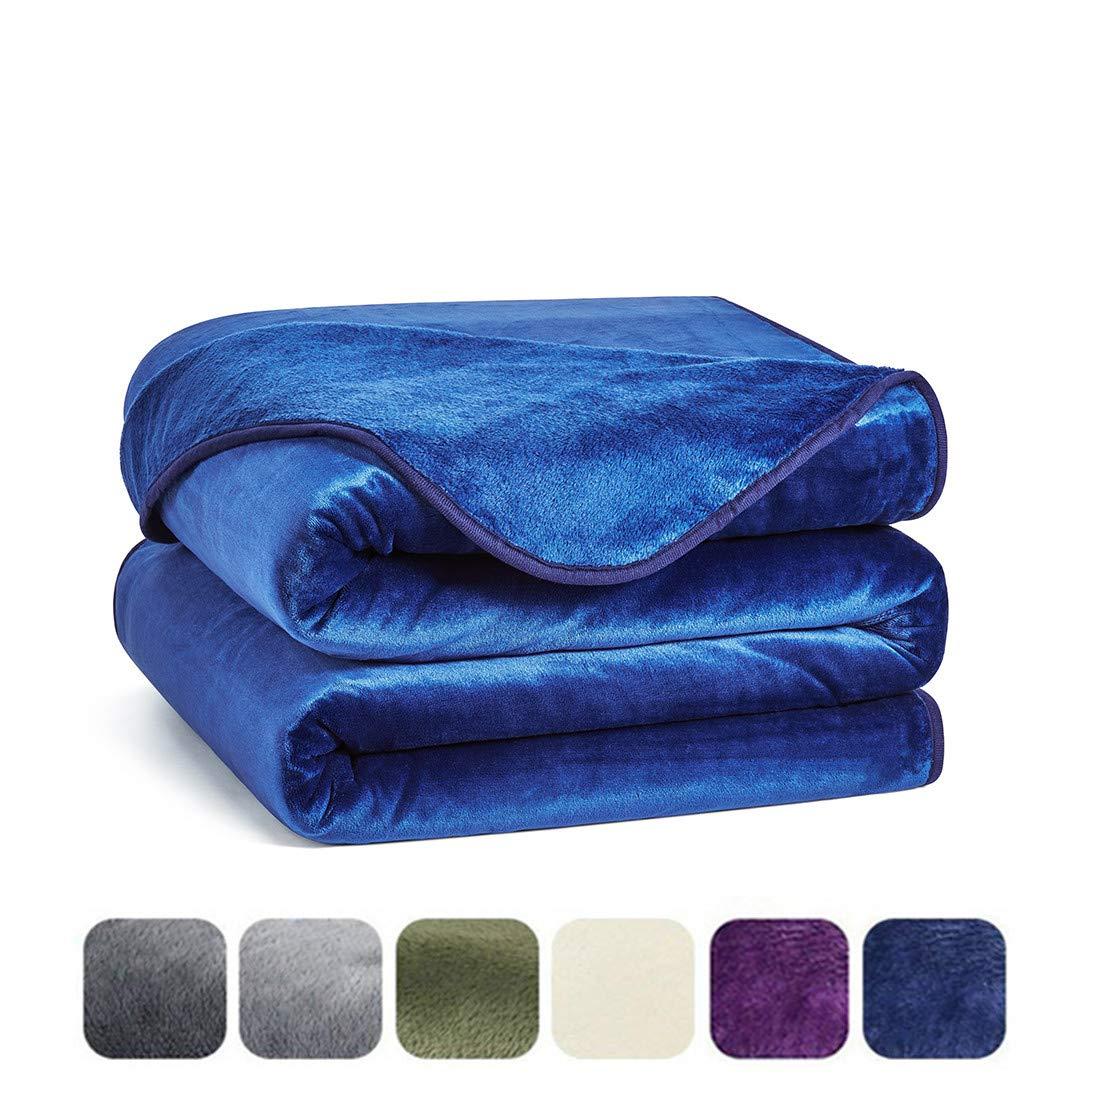 Charm Heart Luxury Fleece Blanket Super Soft Warm 350gsm